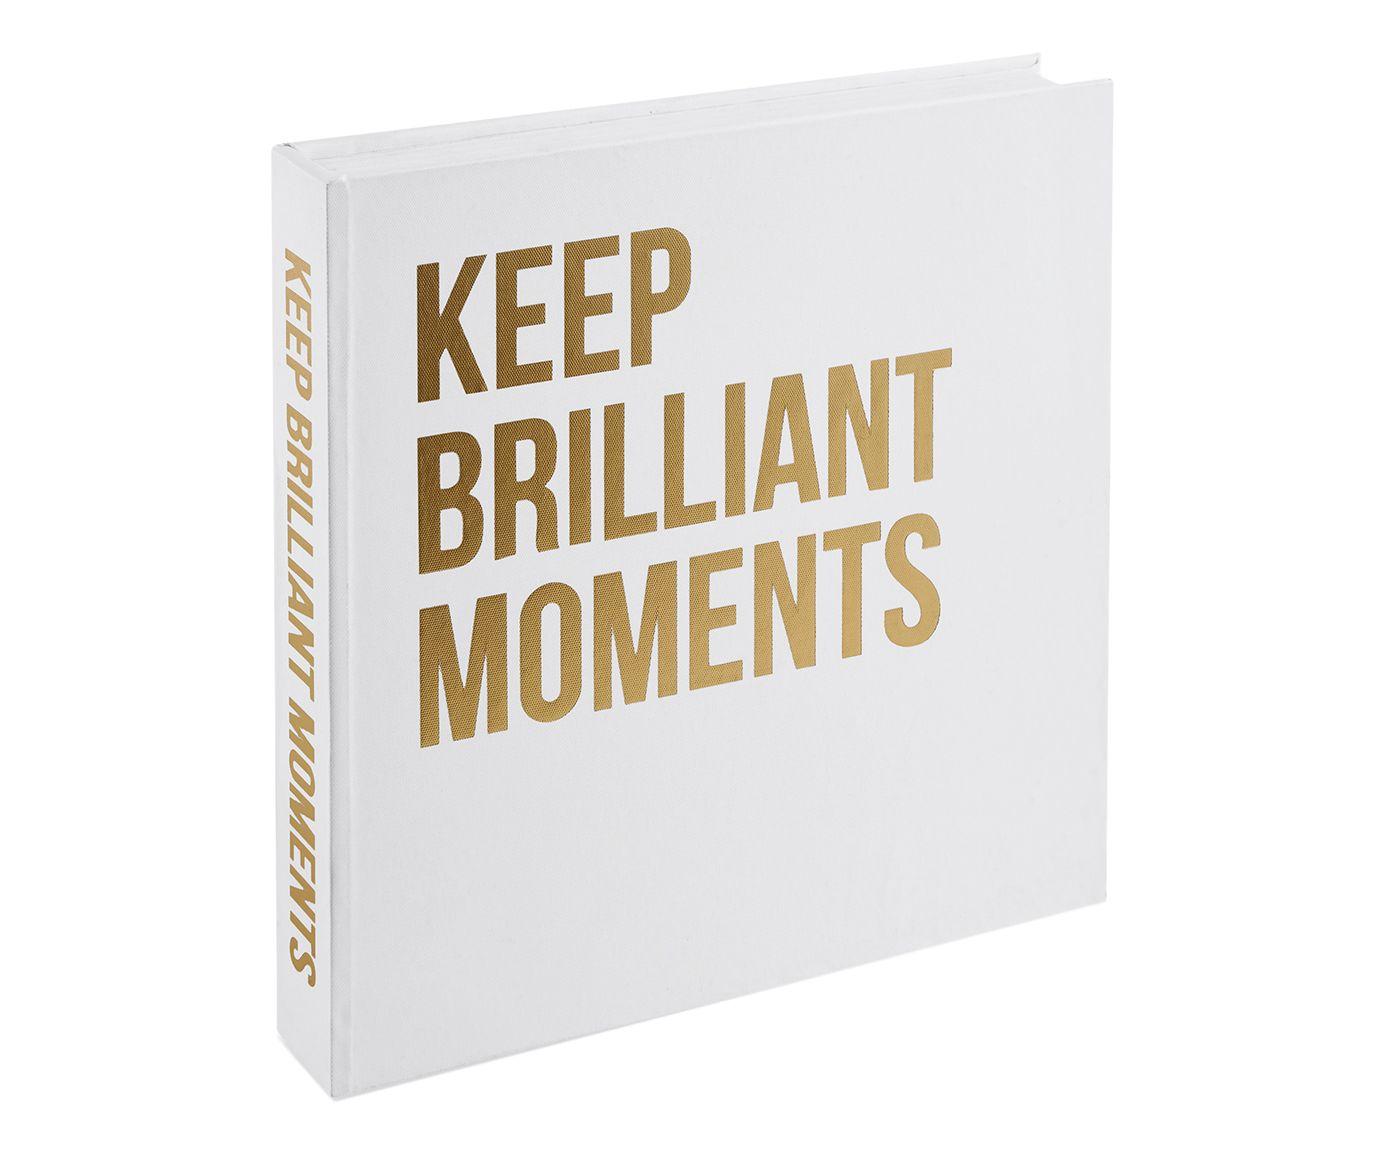 Book Box Keep Brilliant Moments - 5X30cm | Westwing.com.br